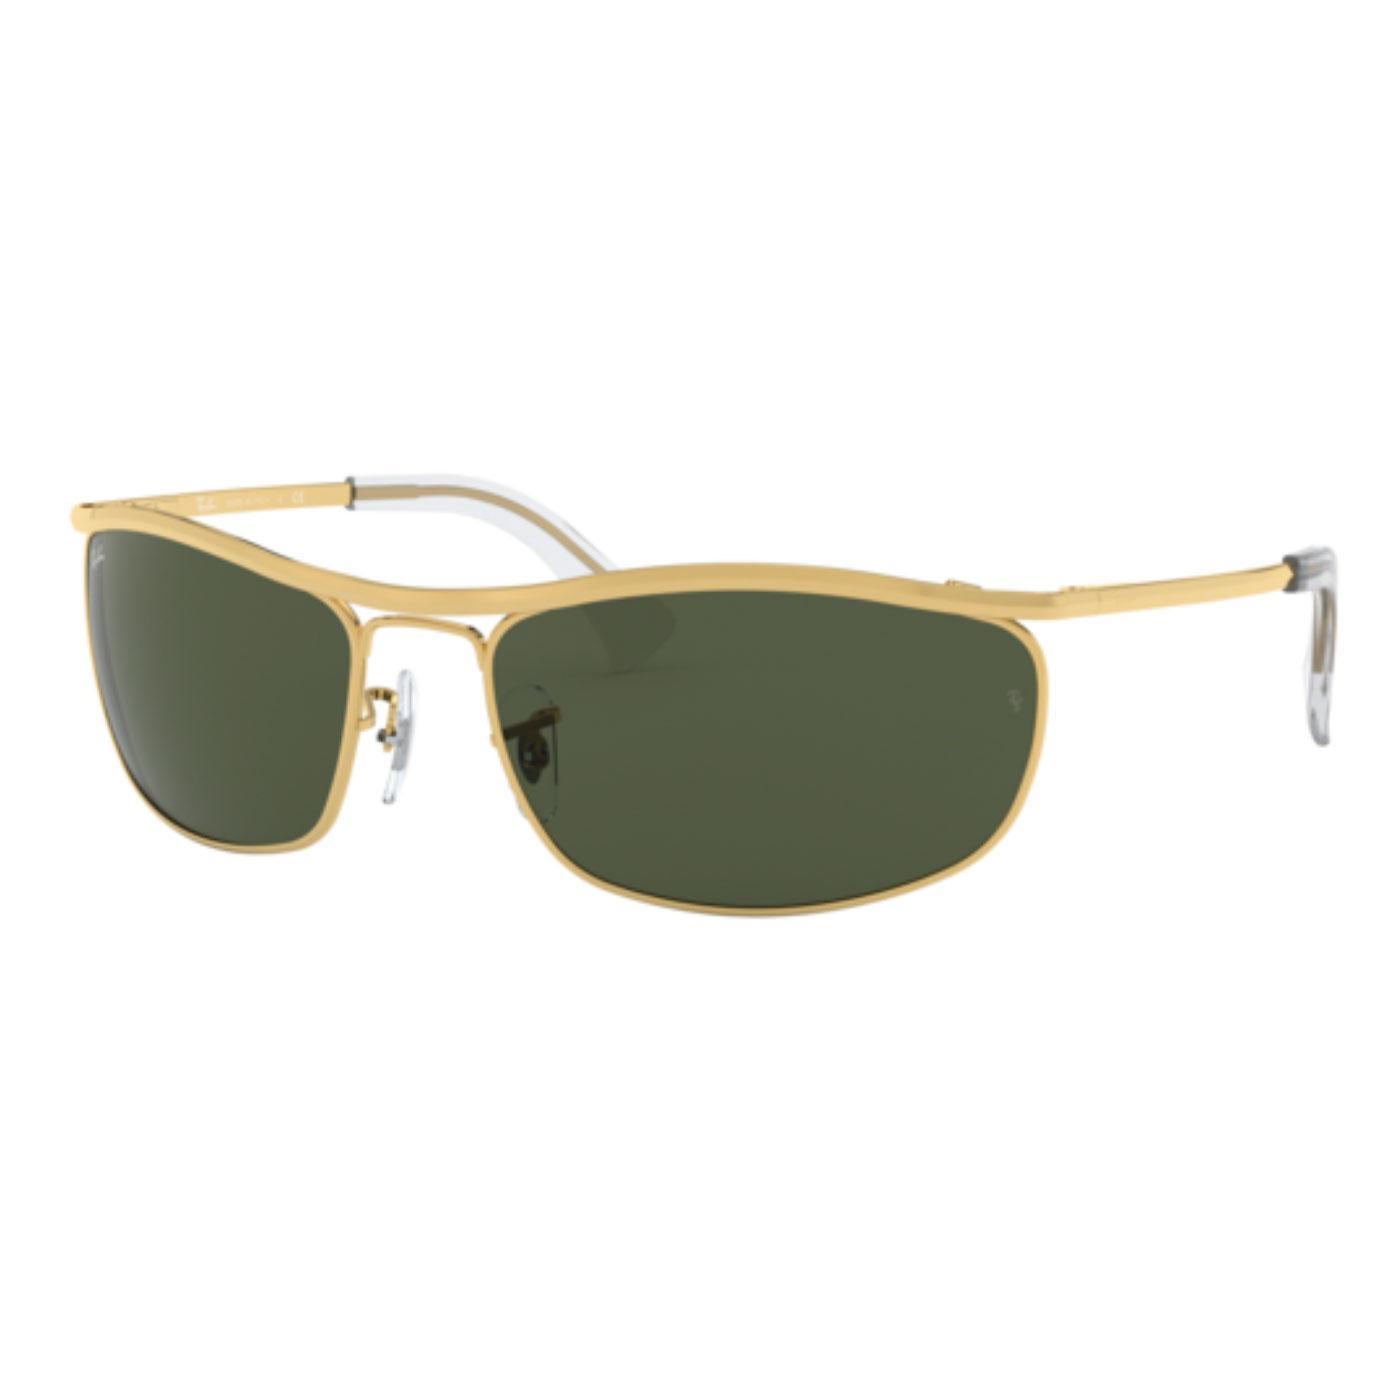 Olympian RAY-BAN Retro Mod Icons Sunglasses (AG)